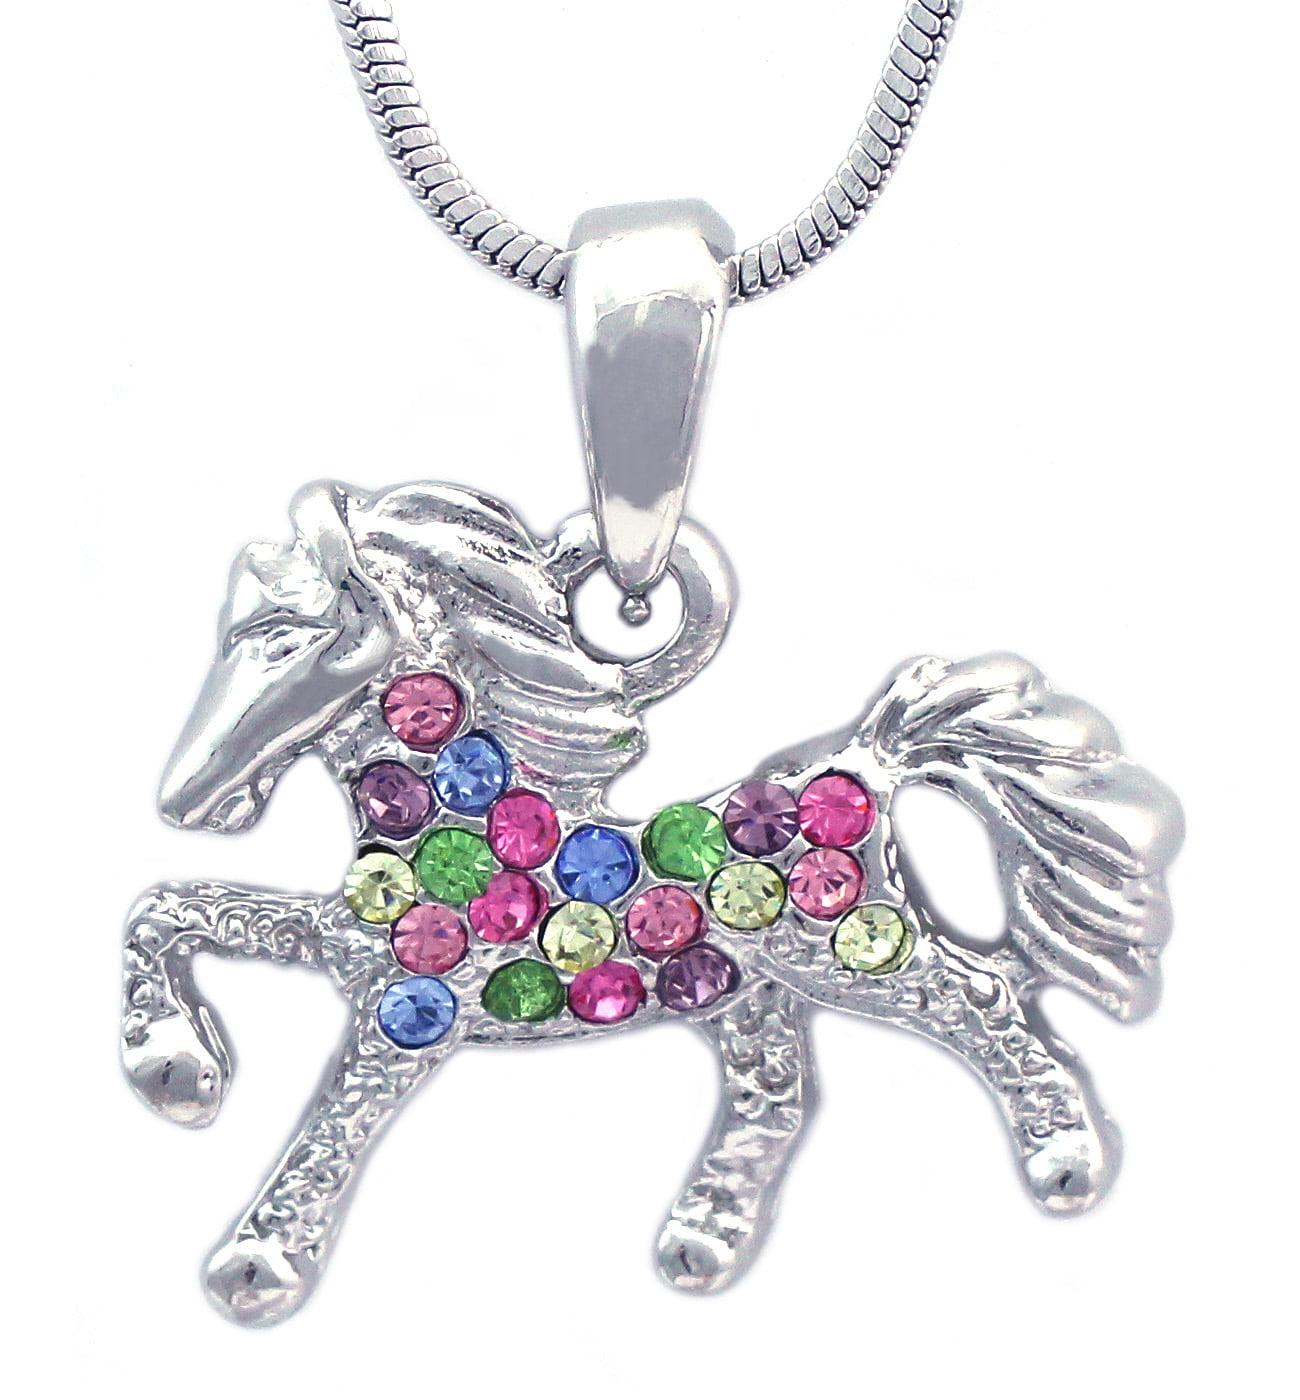 cocojewelry Small Horse Pony Pegasus Pendant Necklace Girl Jewelry